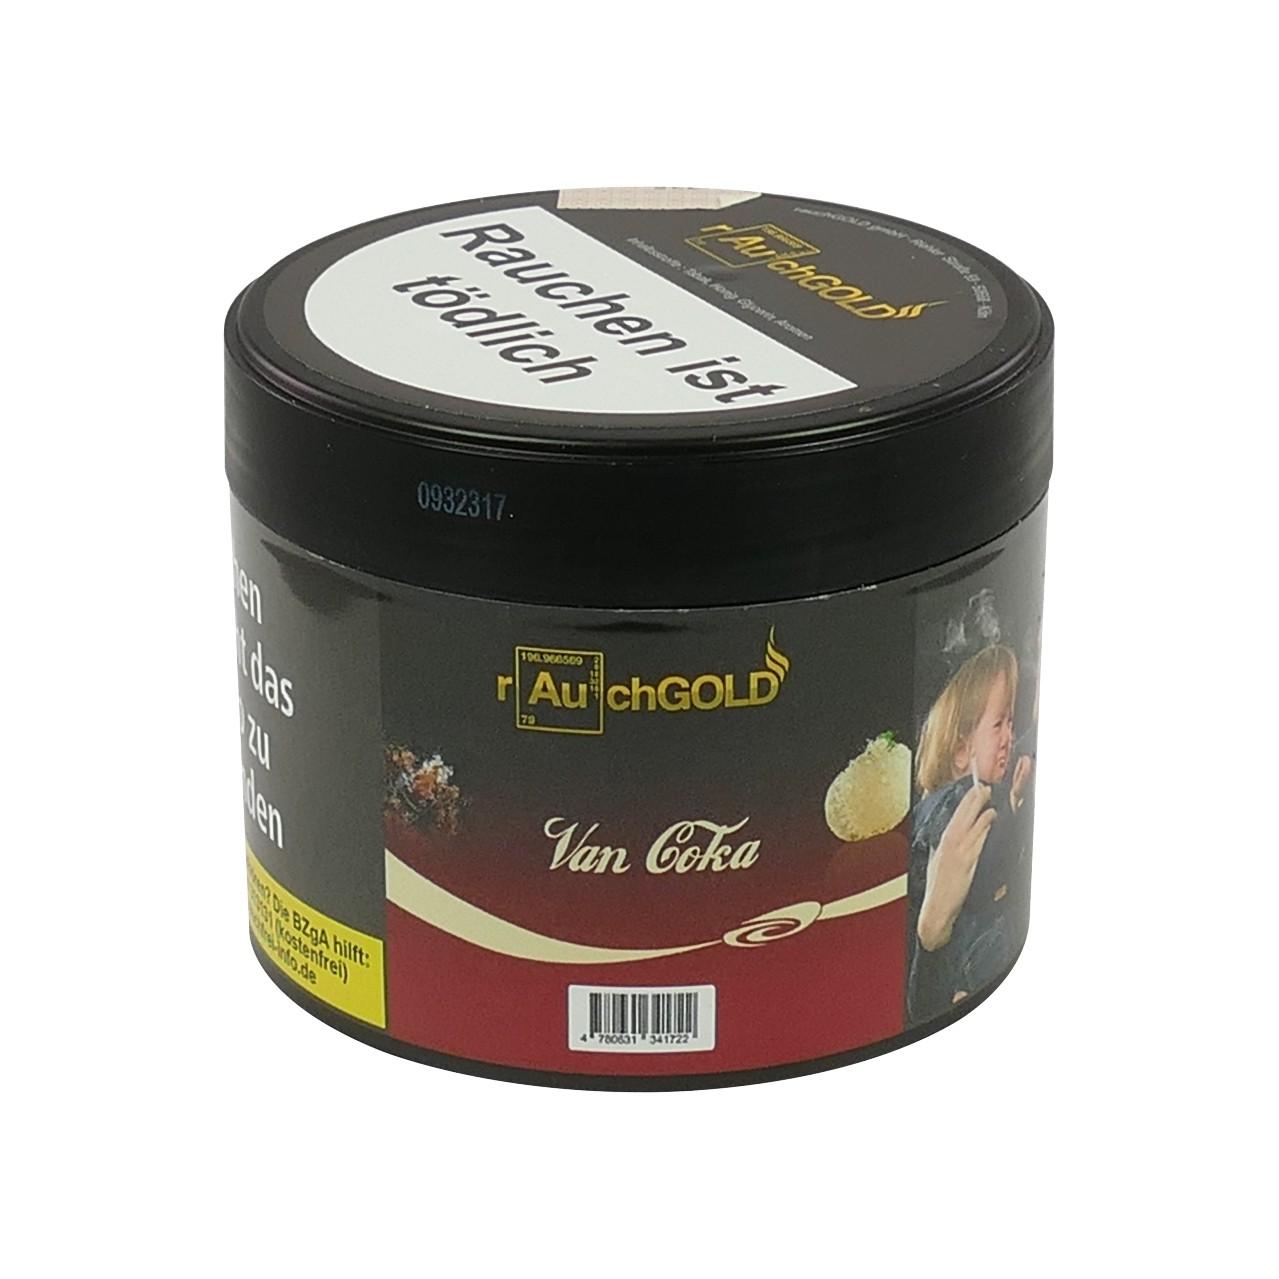 Rauchgold Cola Vanille (Van Coka) Shisha Tabak, 200g